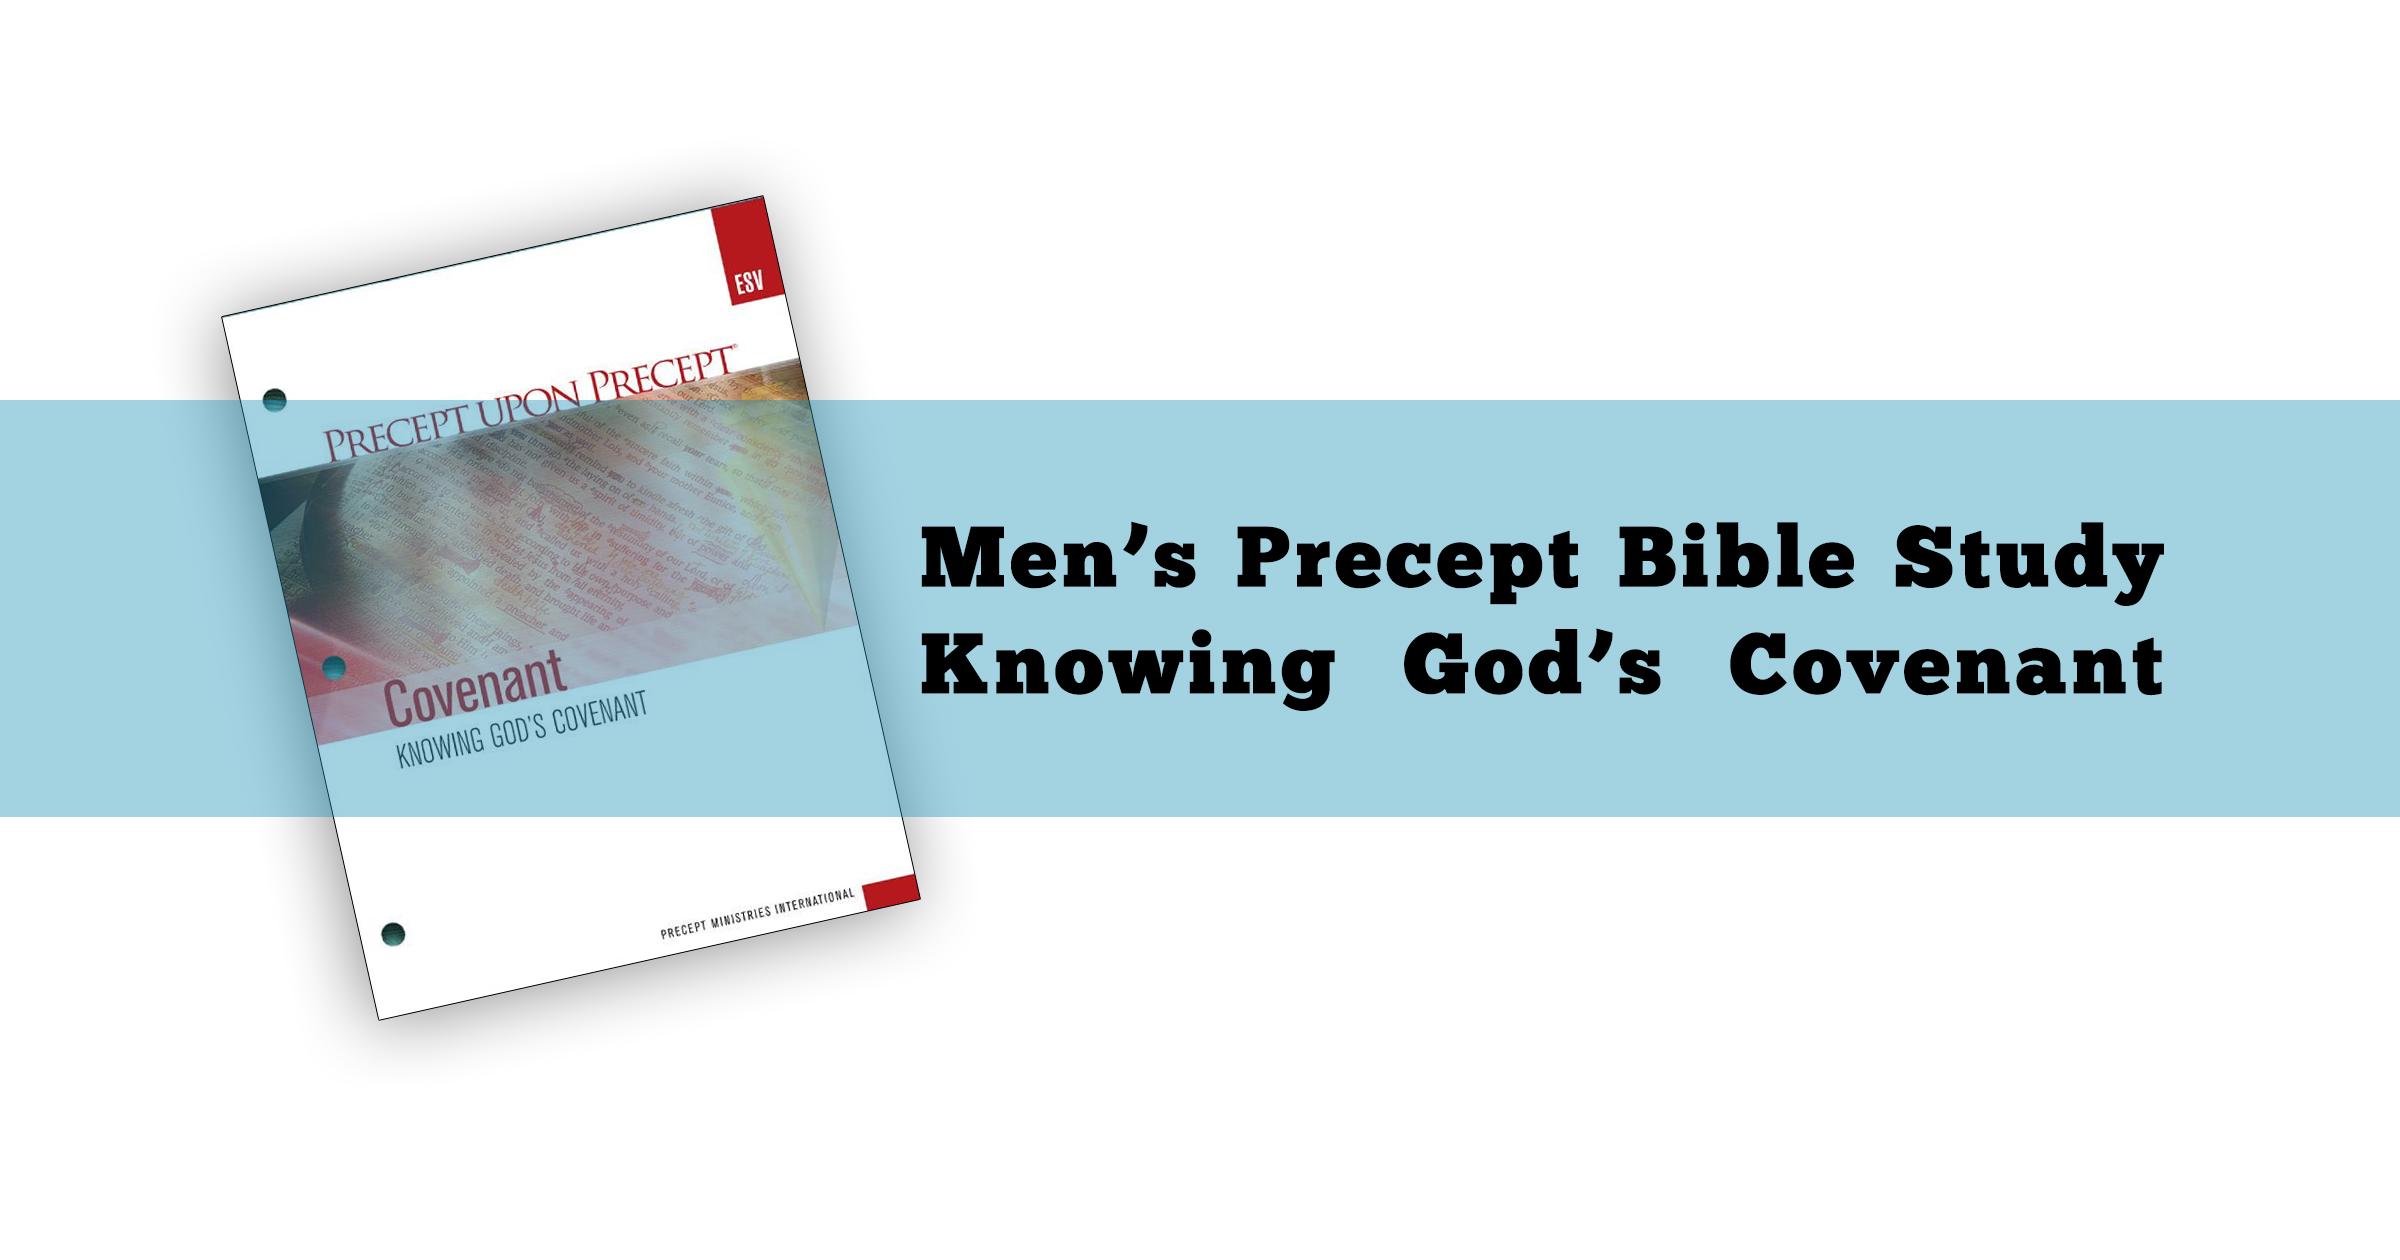 Men's Precept - Knowing God's Covenant - Carrickfergus